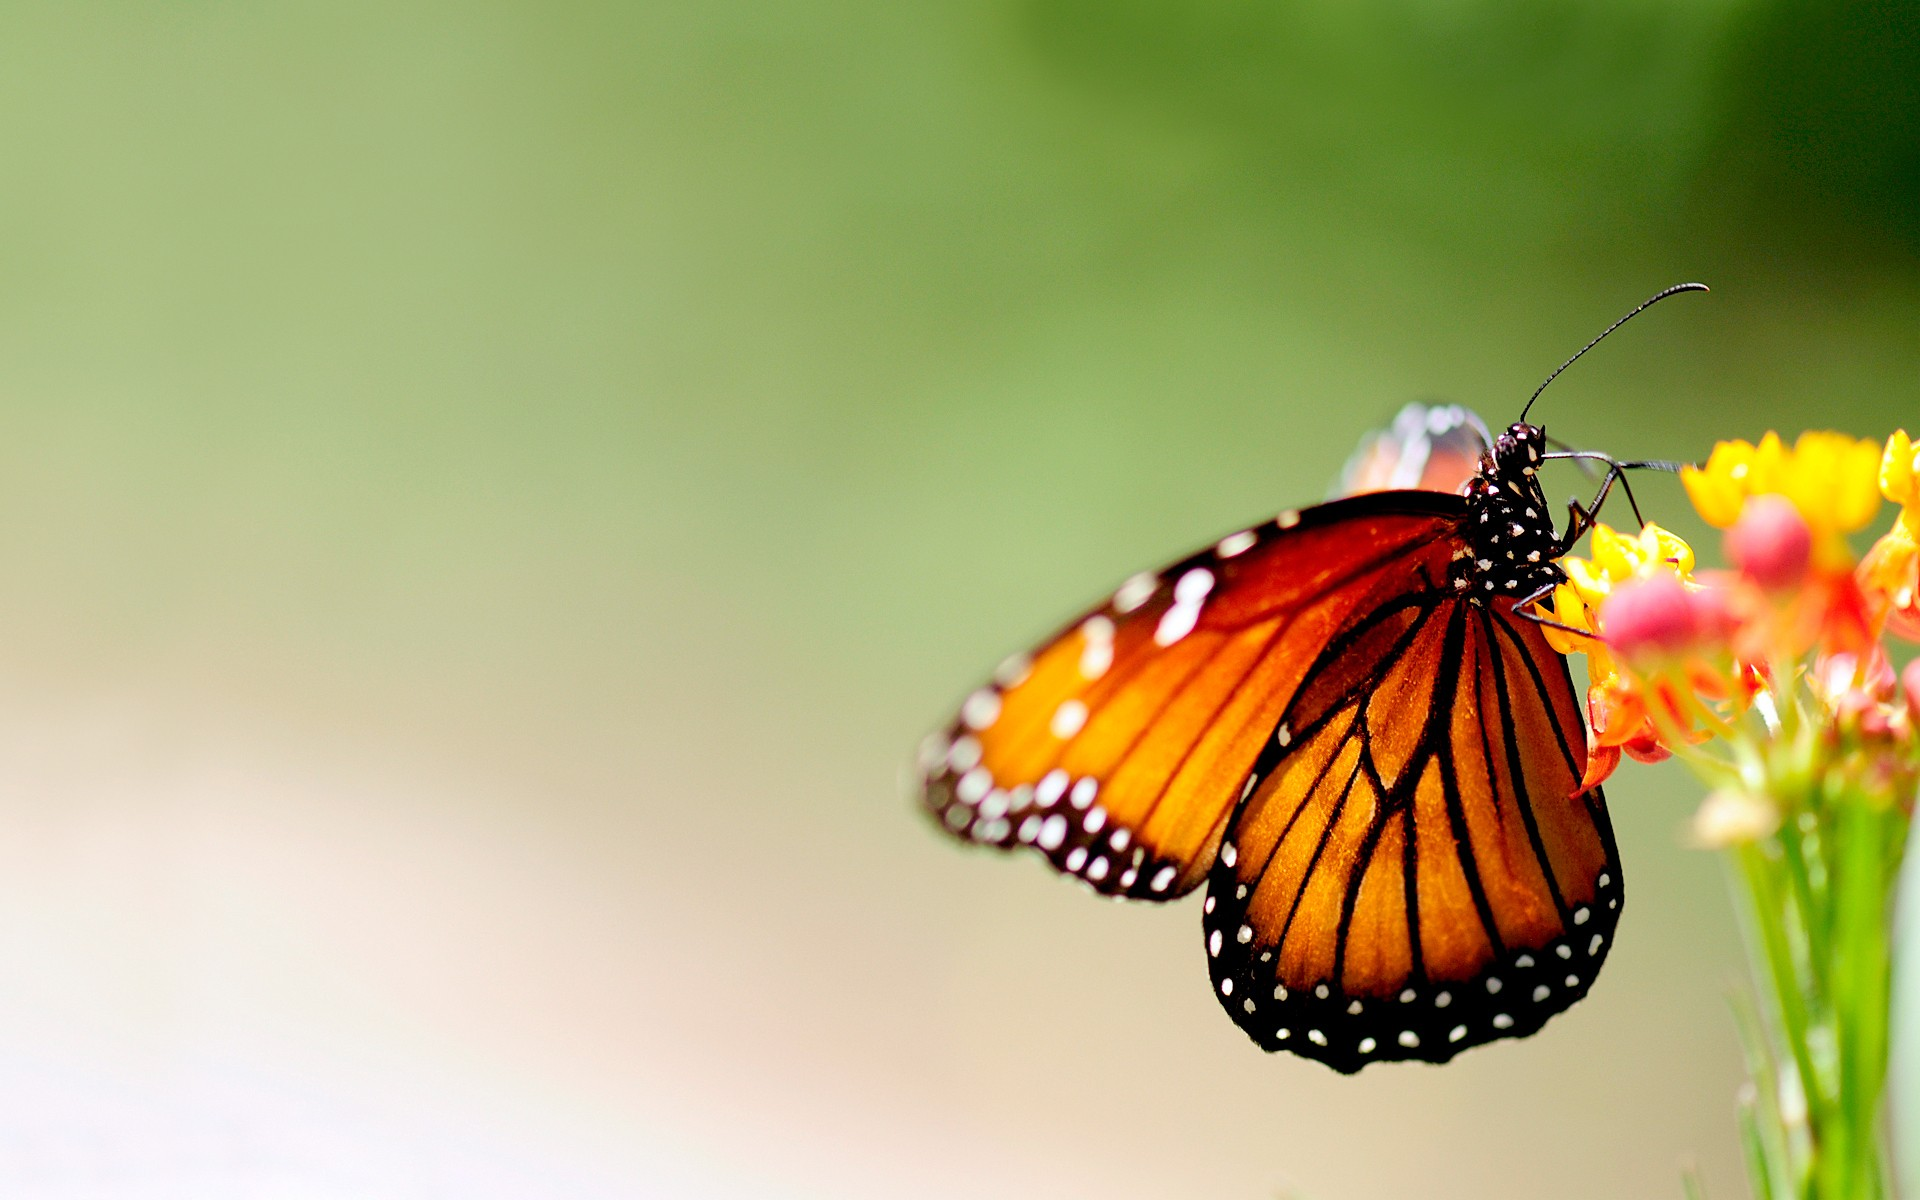 Butterflies wallpaper ·① Download free cool full HD ...